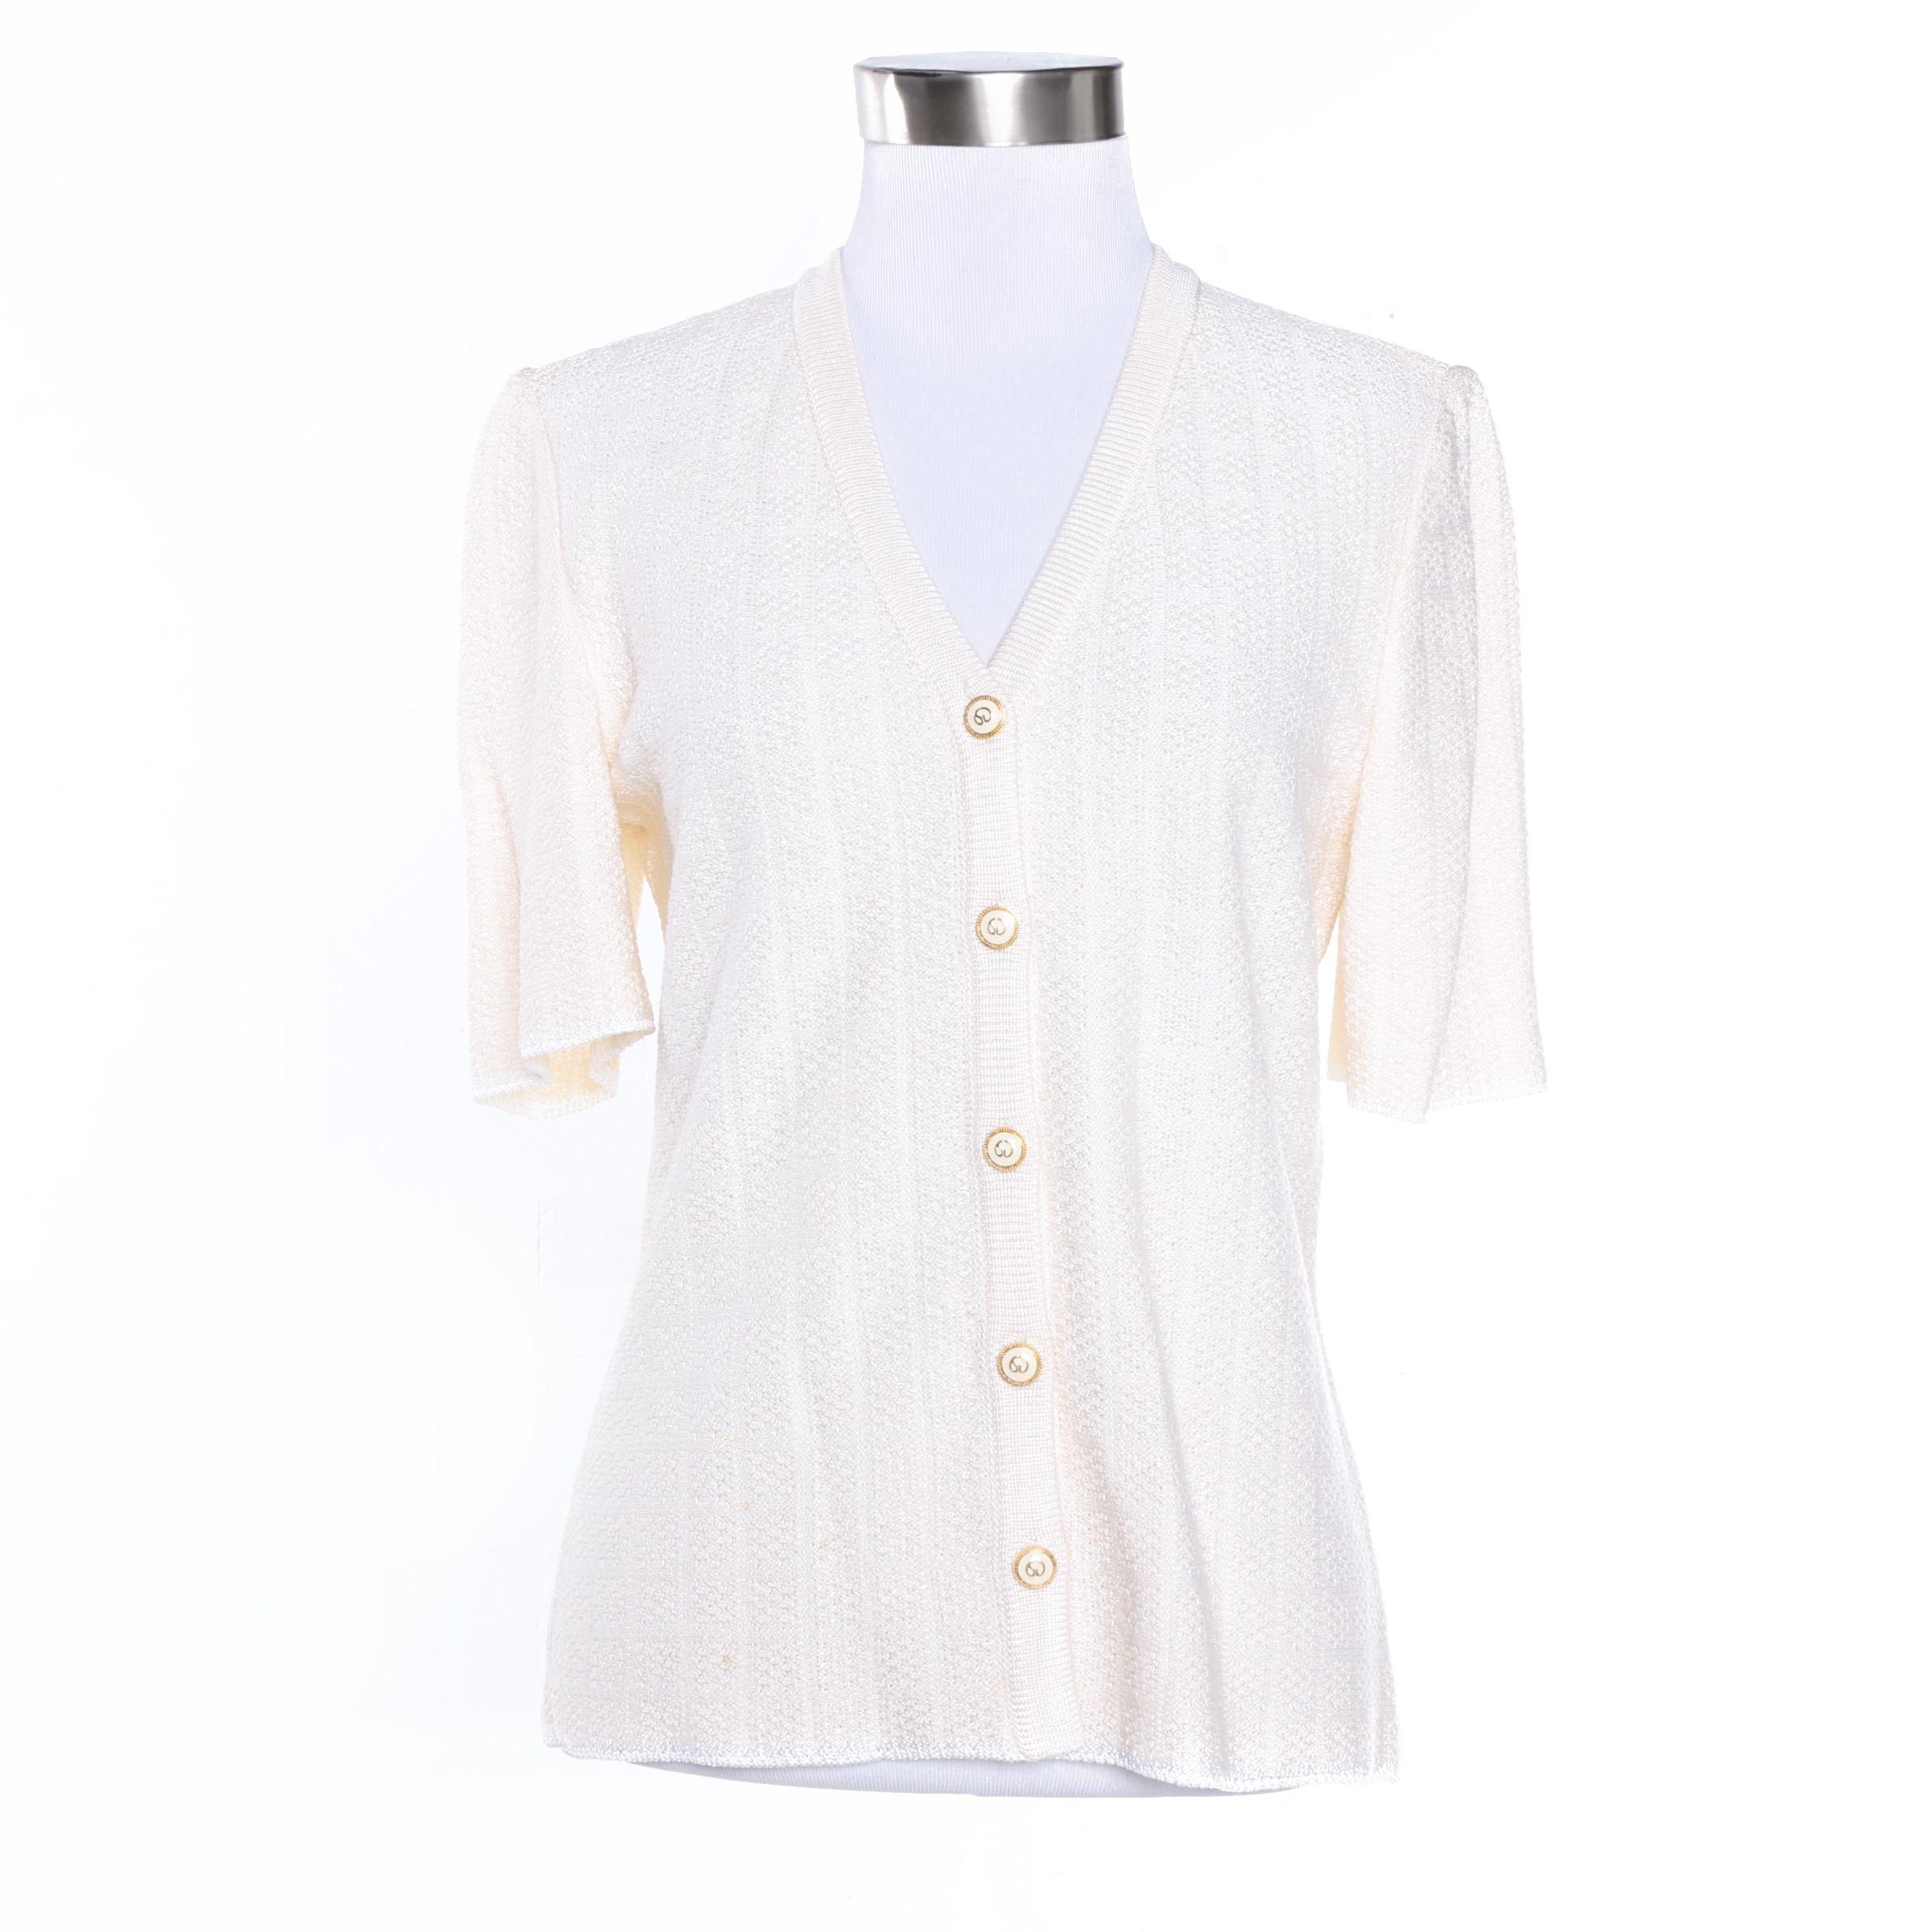 Women's St. John Collection Short Sleeved Knit Cardigan